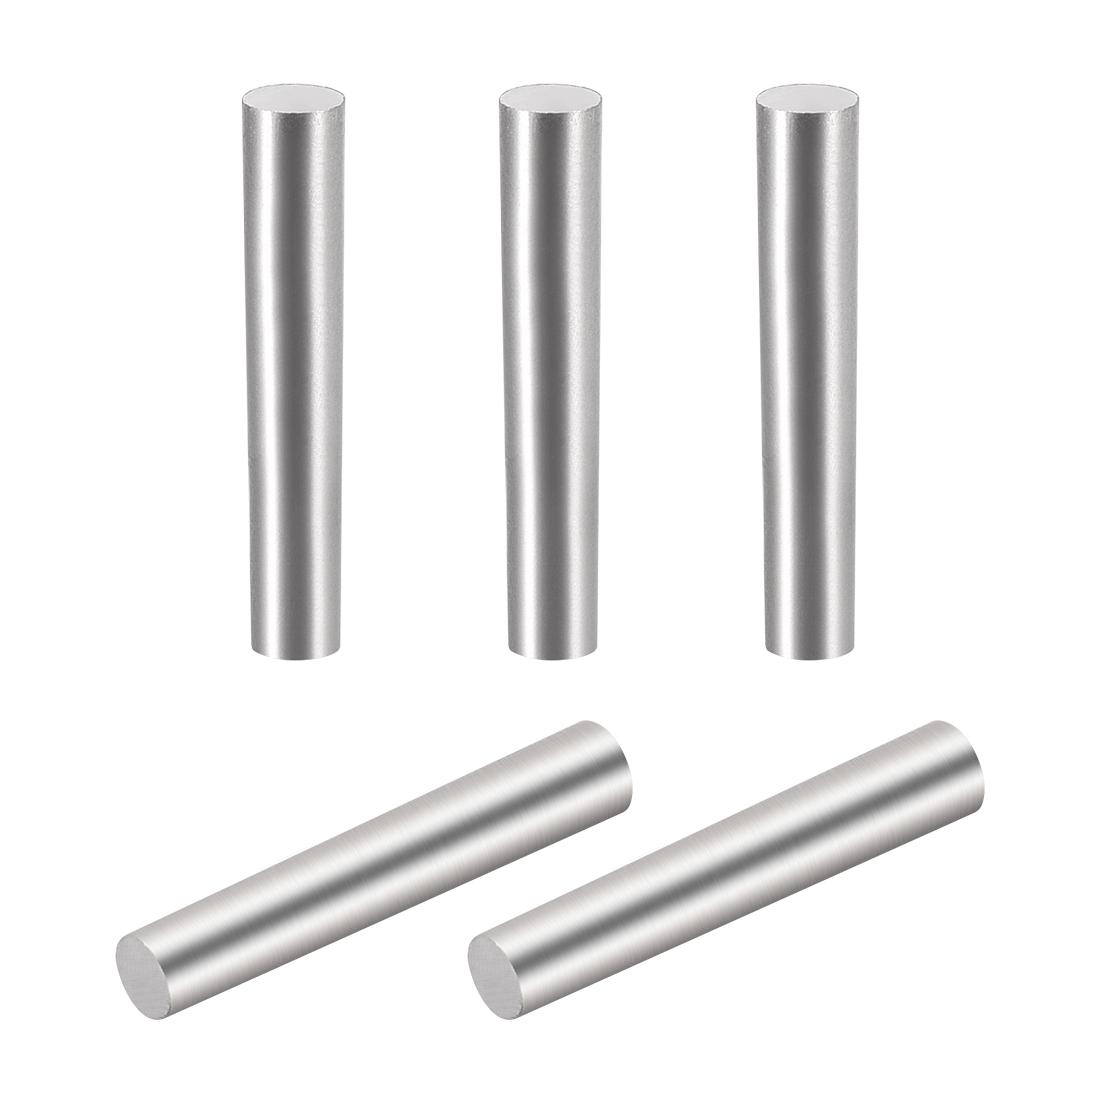 5Pcs 4mm x 25mm 1:50 Taper Pin 304 Stainless Steel Shelf Support Pin Fasten